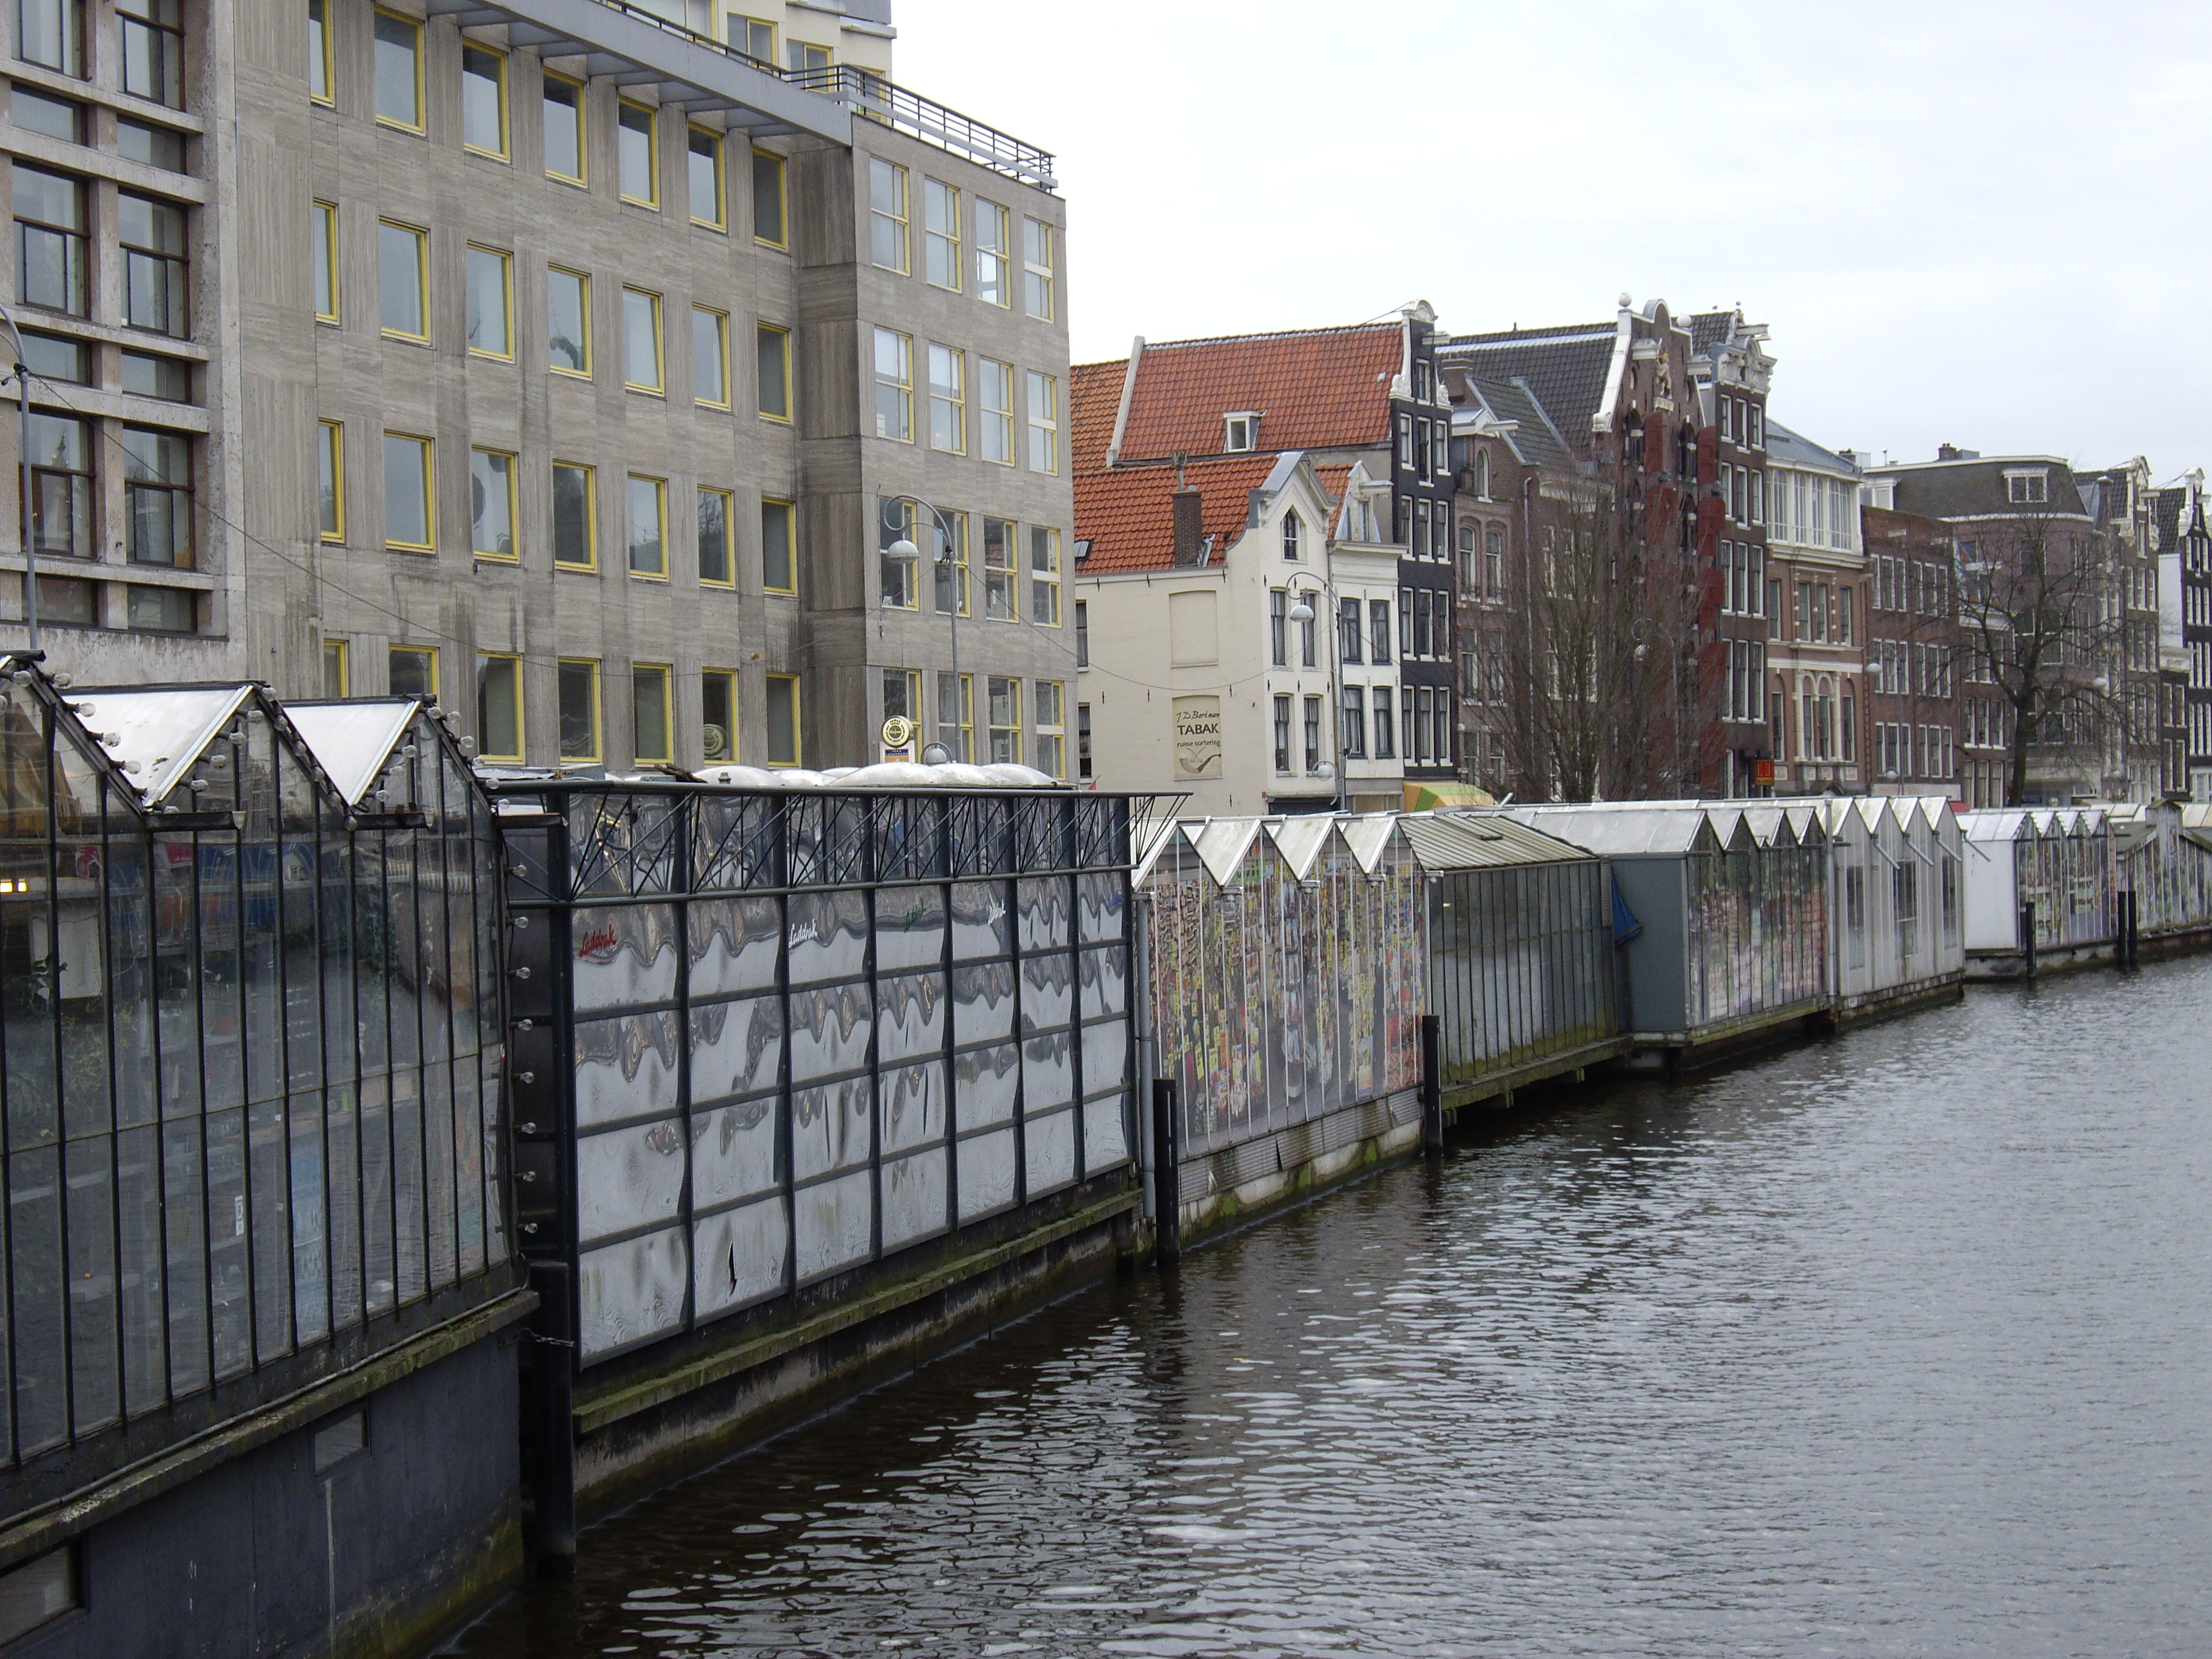 AMSTERDAM - Voyage Week End Escapage Visiter Amsterdam - 4521781173_49316e8e27_o